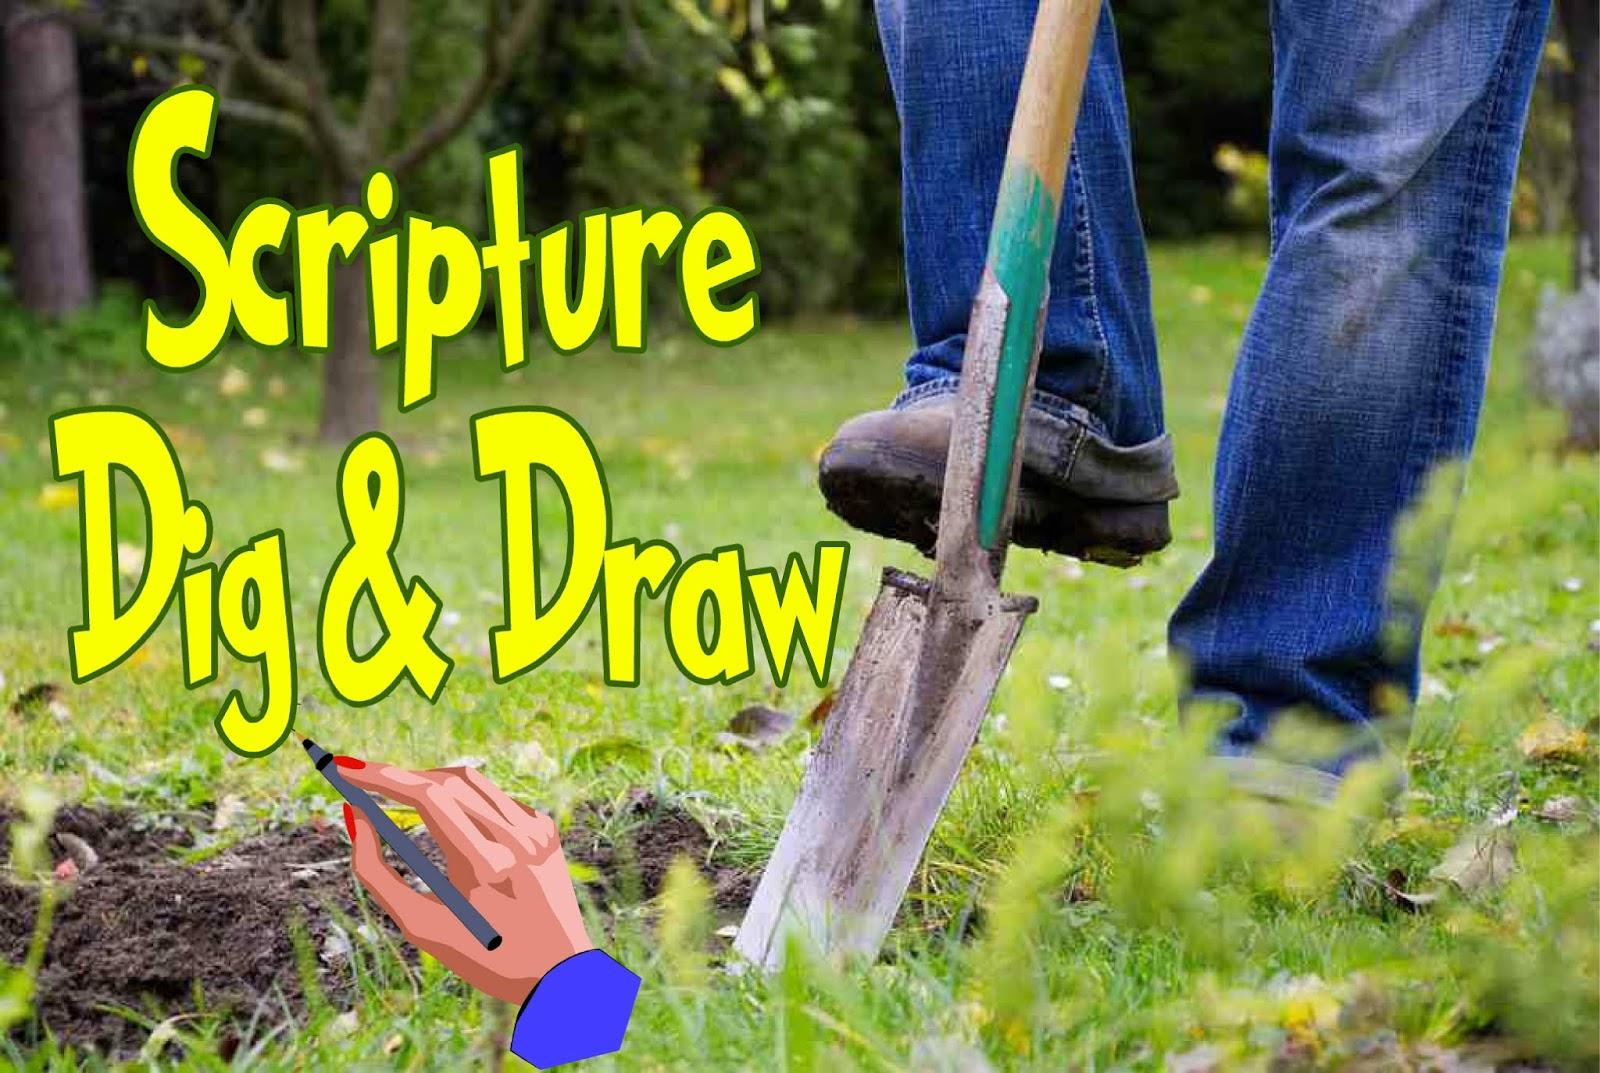 HollysHome - Church Fun: LDS Seminary Scripture Dig & Draw